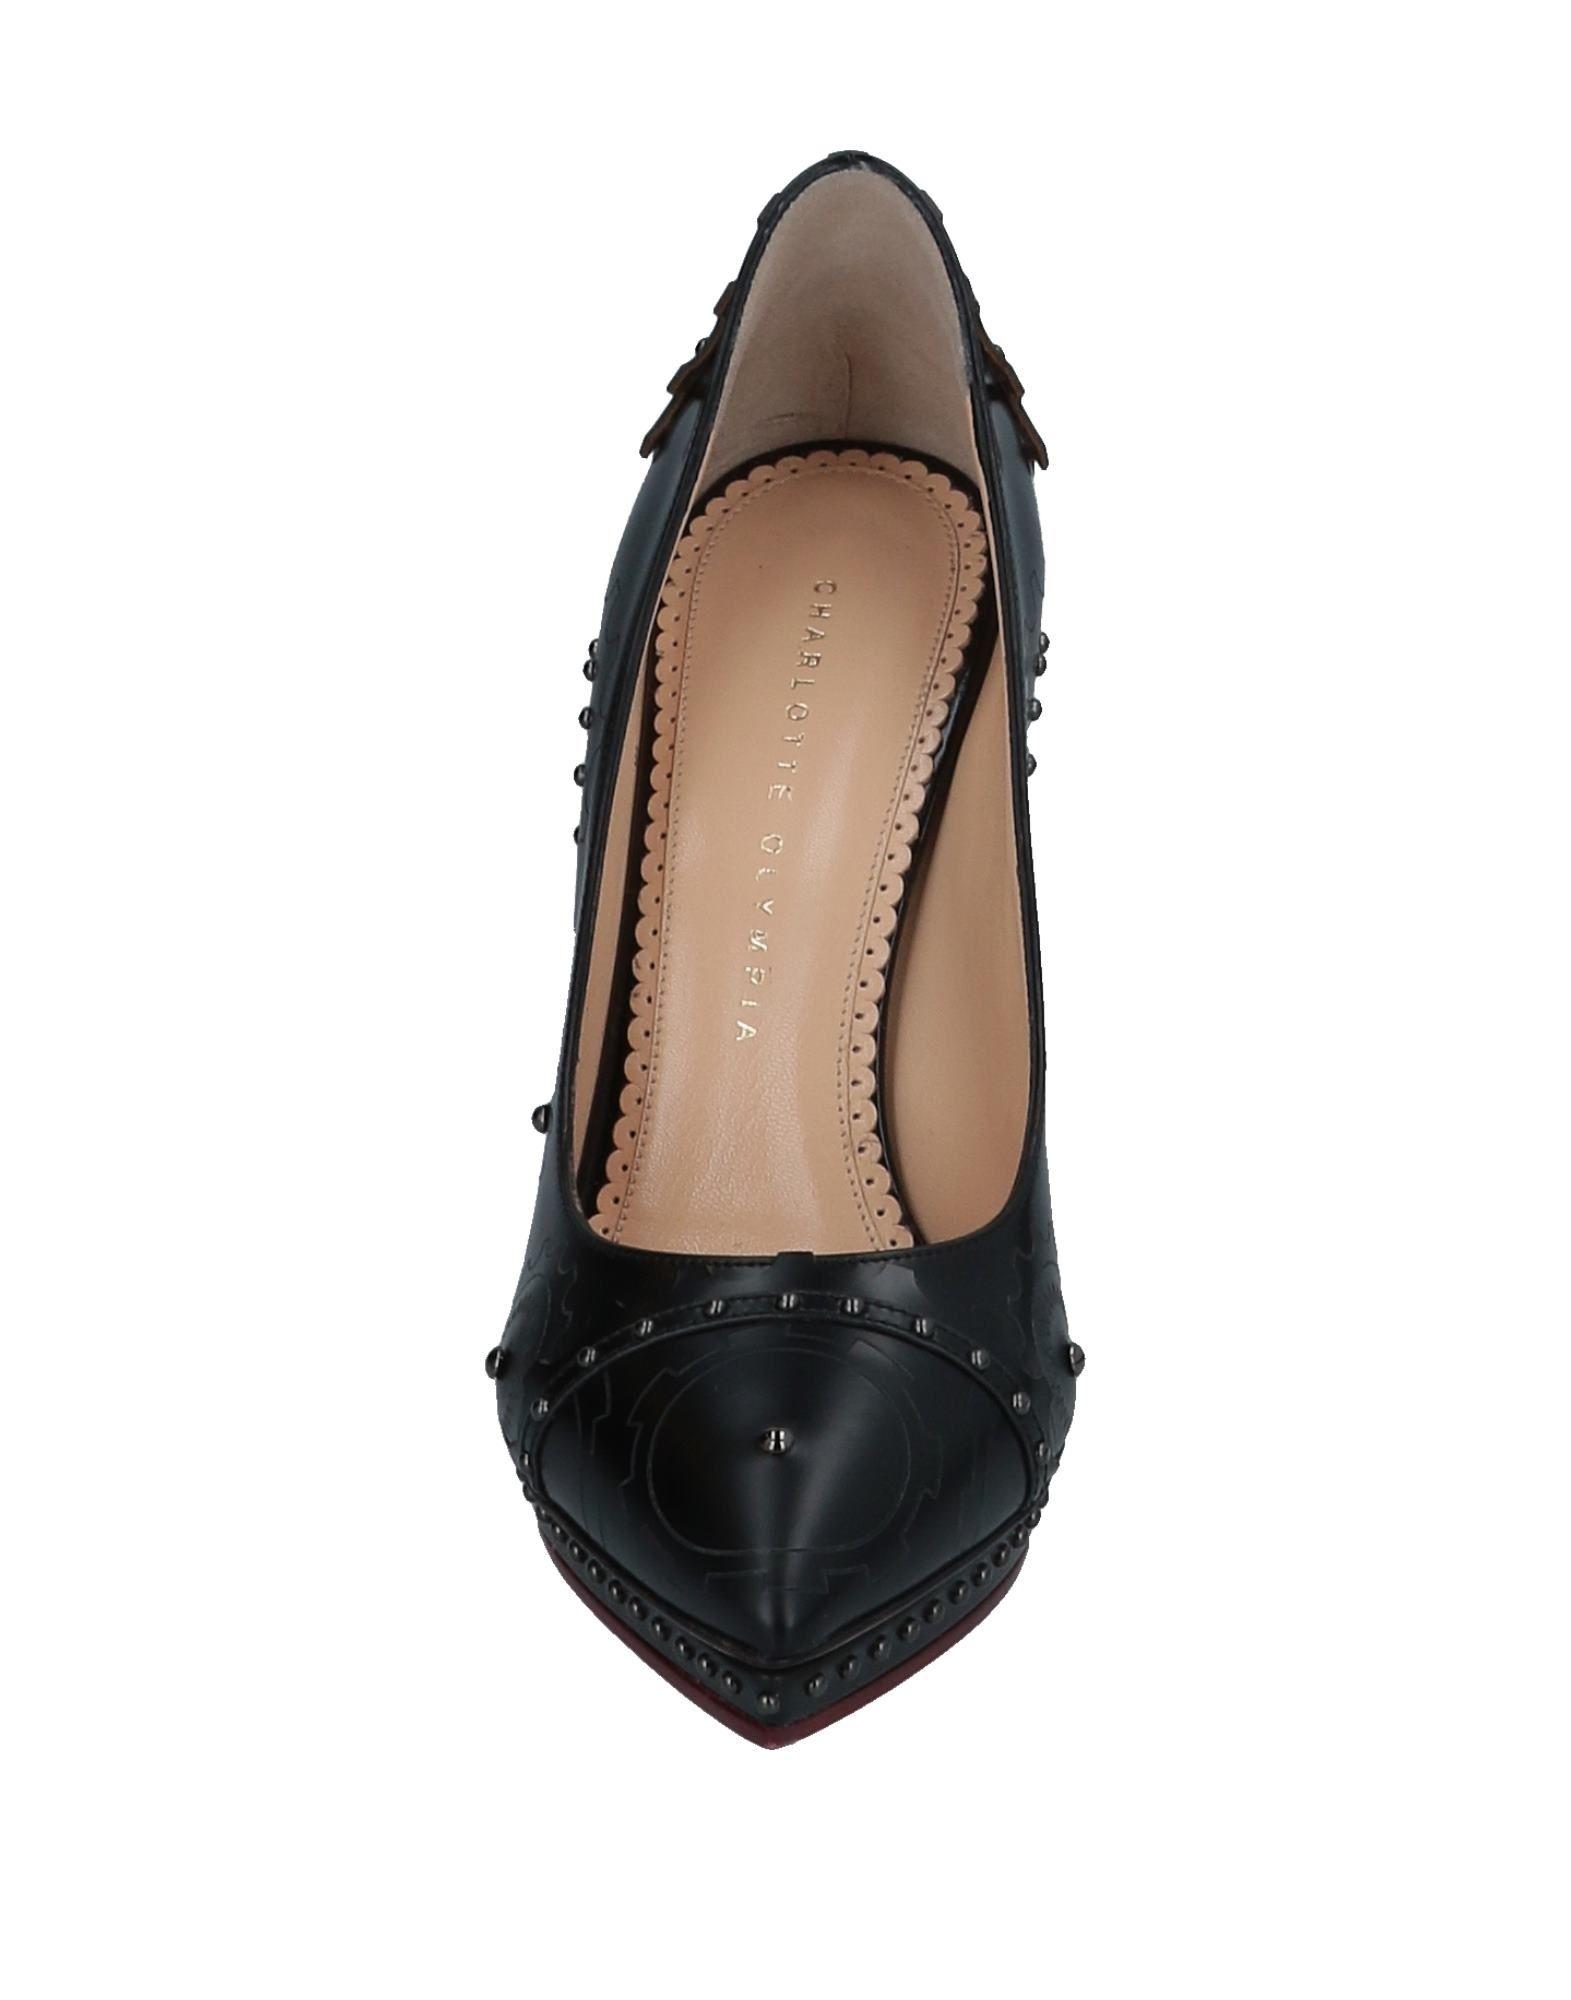 Charlotte Olympia Pumps Damen Schuhe  11527046MKGünstige gut aussehende Schuhe Damen 384756